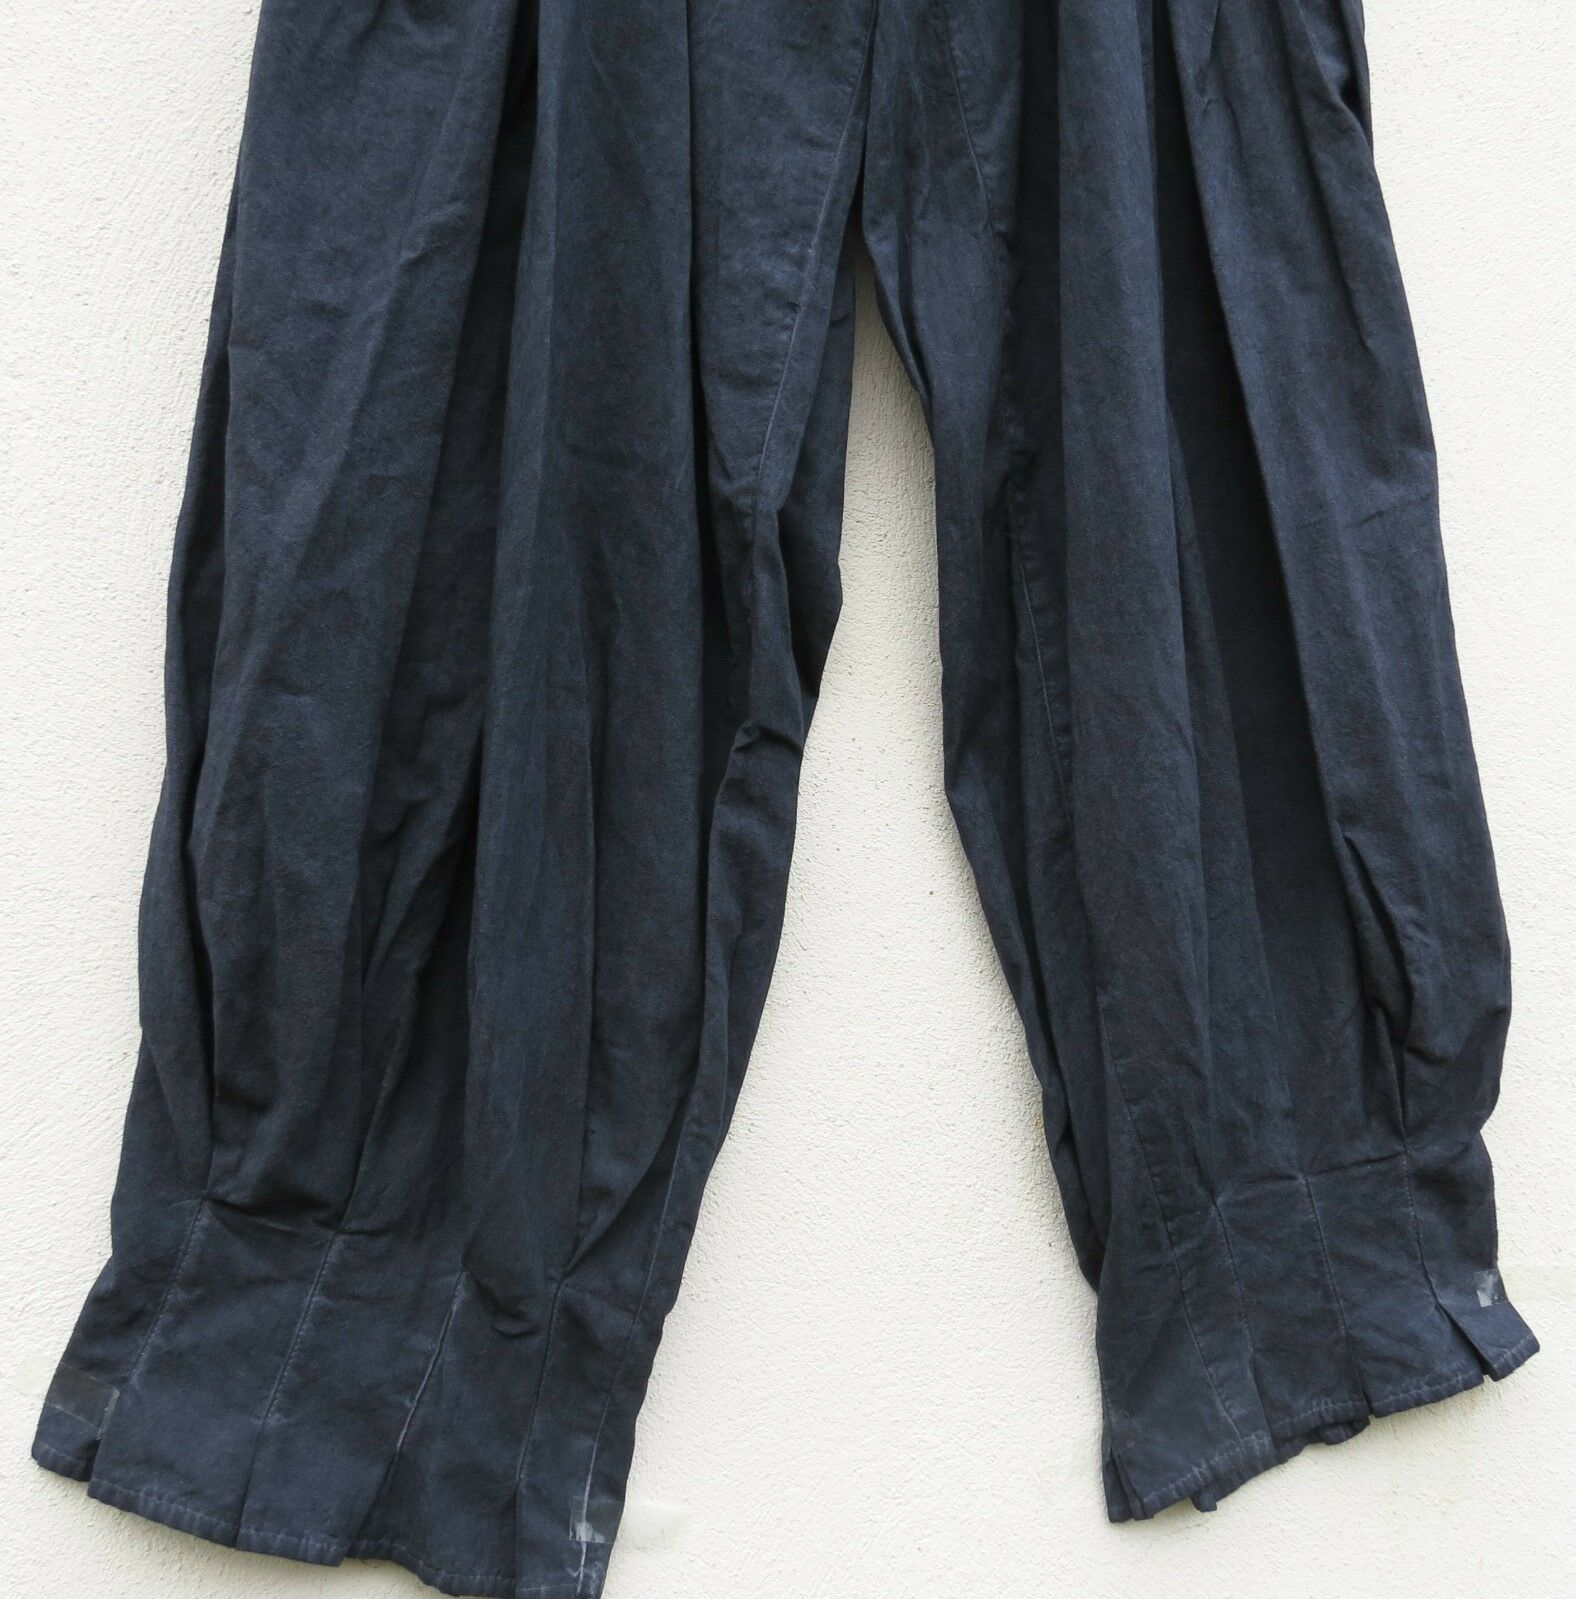 NUOVO D 'Celli pantaloni trousers pantalon pantalon pantalon 10% LINO LINEN XL 48 50 Lagenlook  1b006d